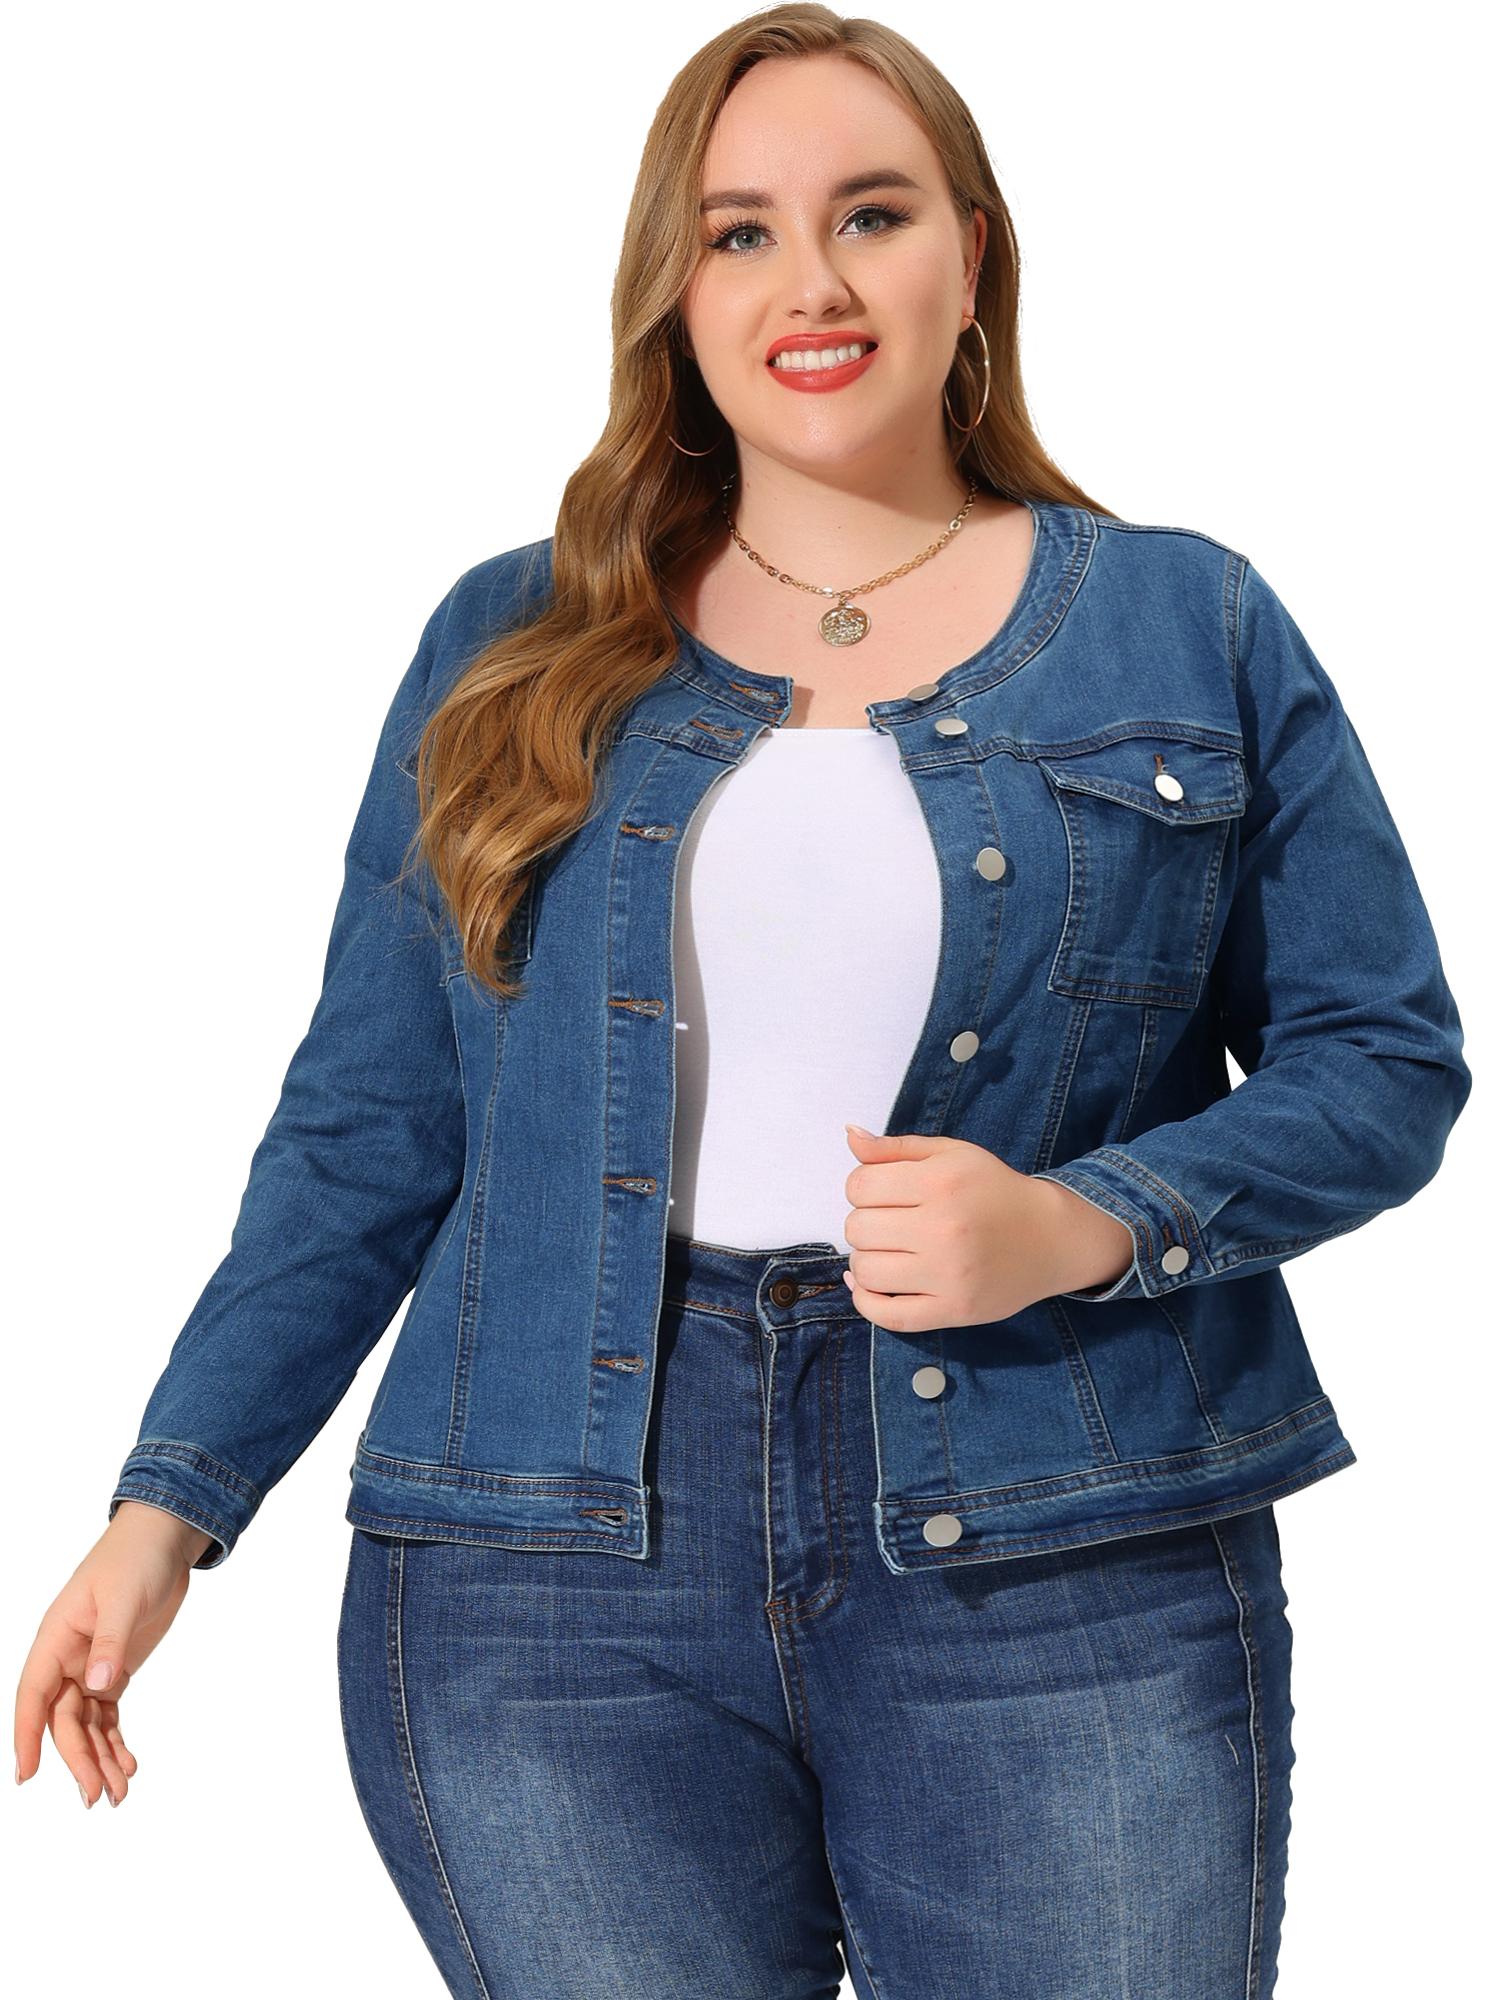 Women's Plus Size Long Sleeves Collarless Denim Jacket Light Blue 4X